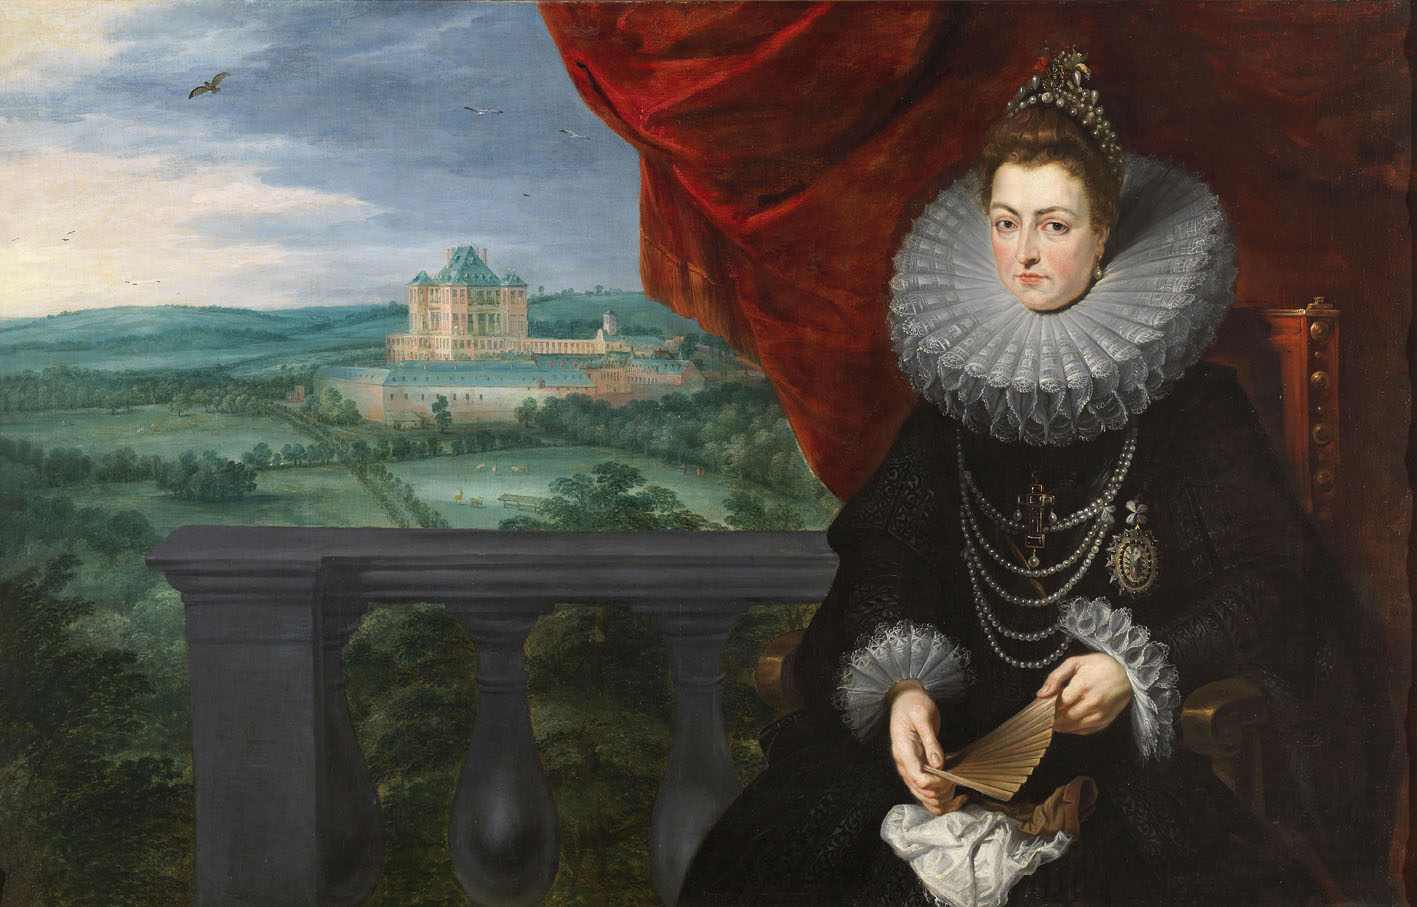 Exposition Rubens, portraits princiers